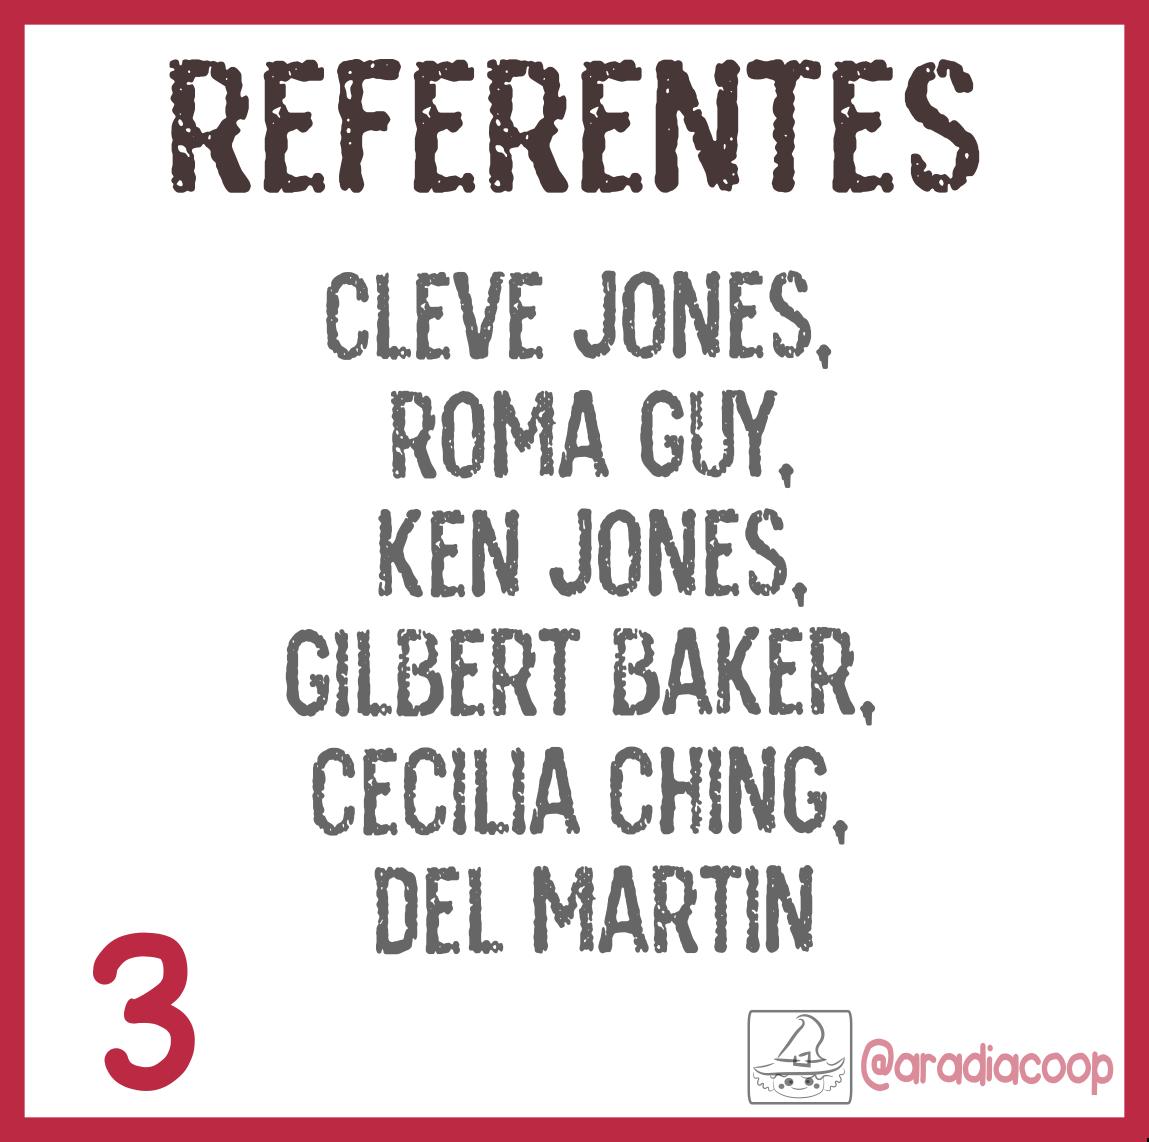 3. Referentes